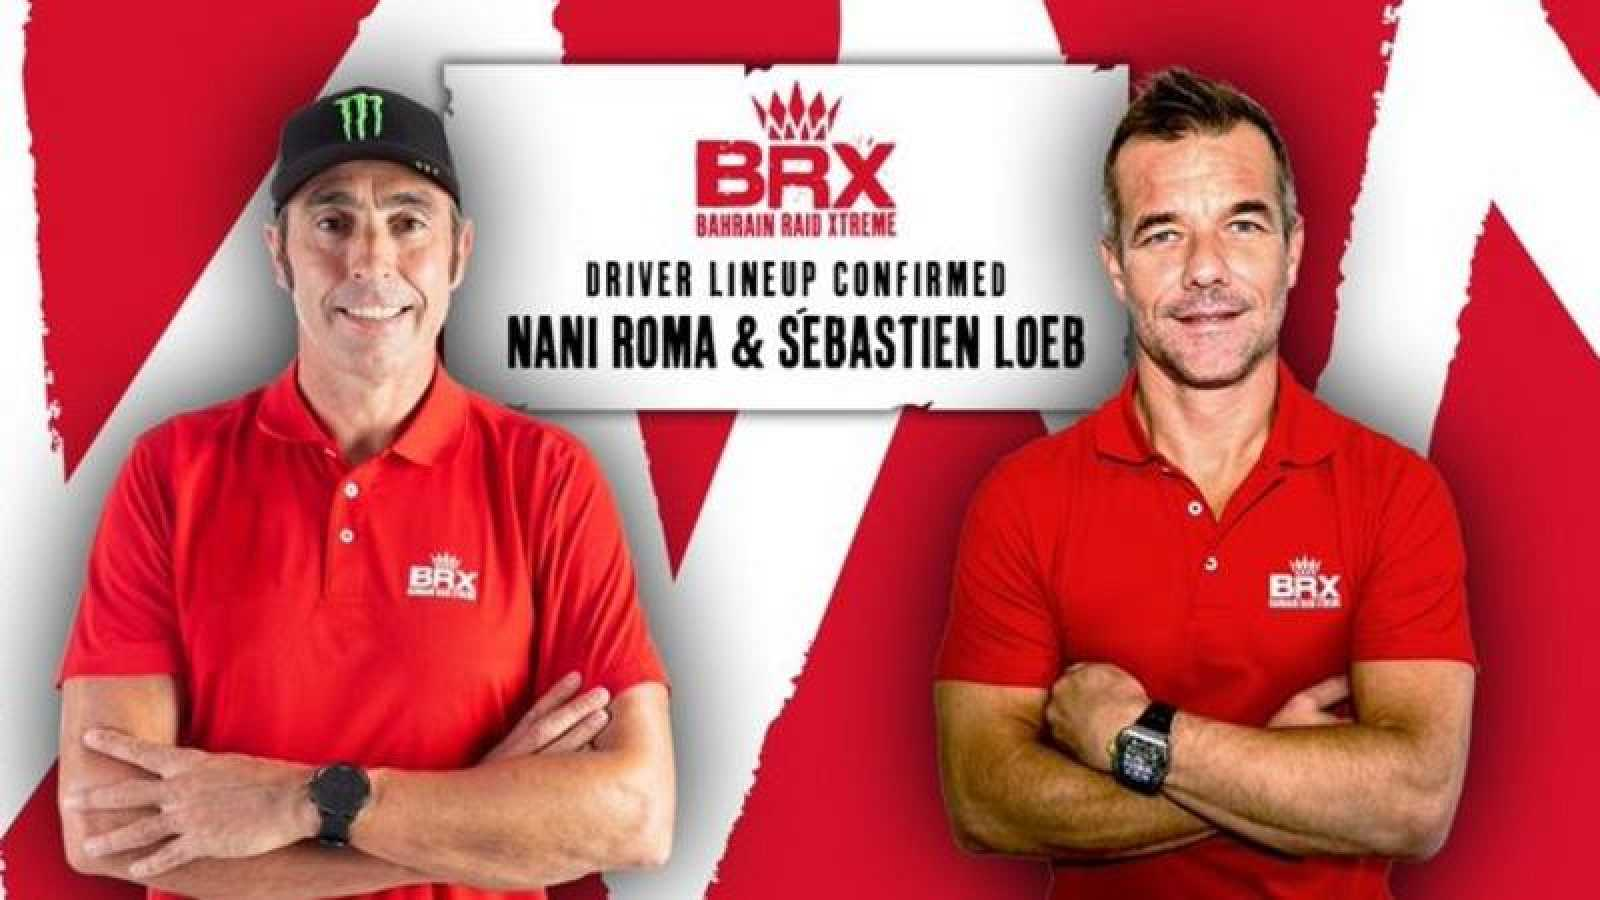 Imagen de Sebastian Loeb y Nani Roma tras anunciar que compartirán equipo para el Dakar 2021.